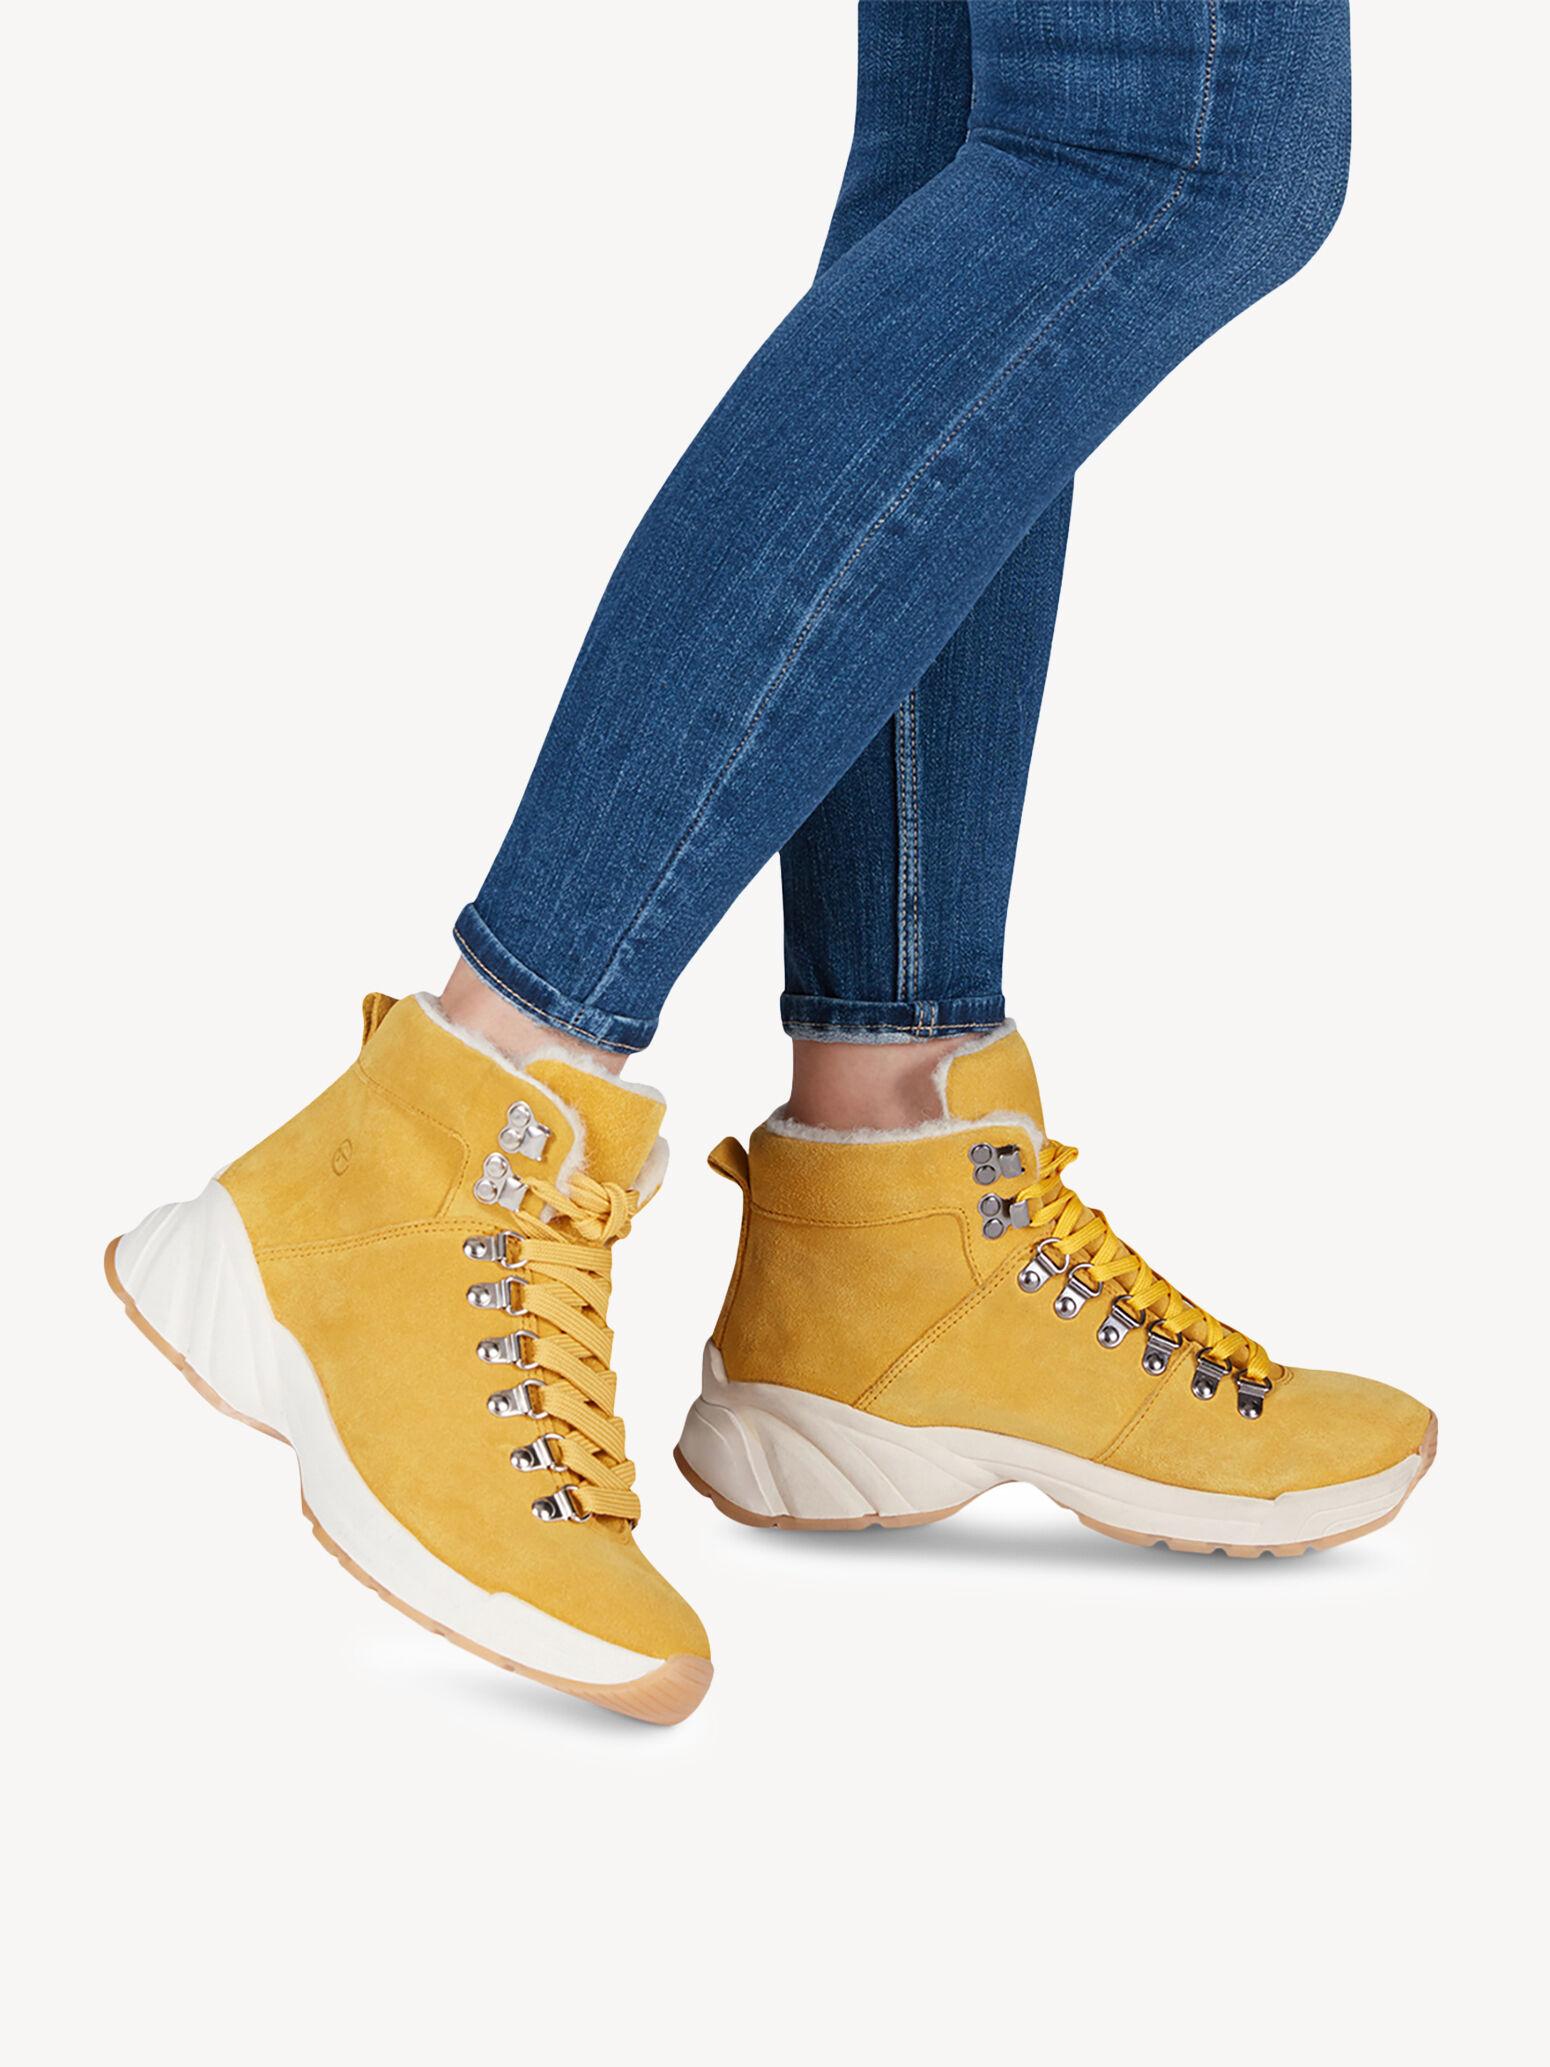 competitive price 83e58 043e4 tamaris boots gelb